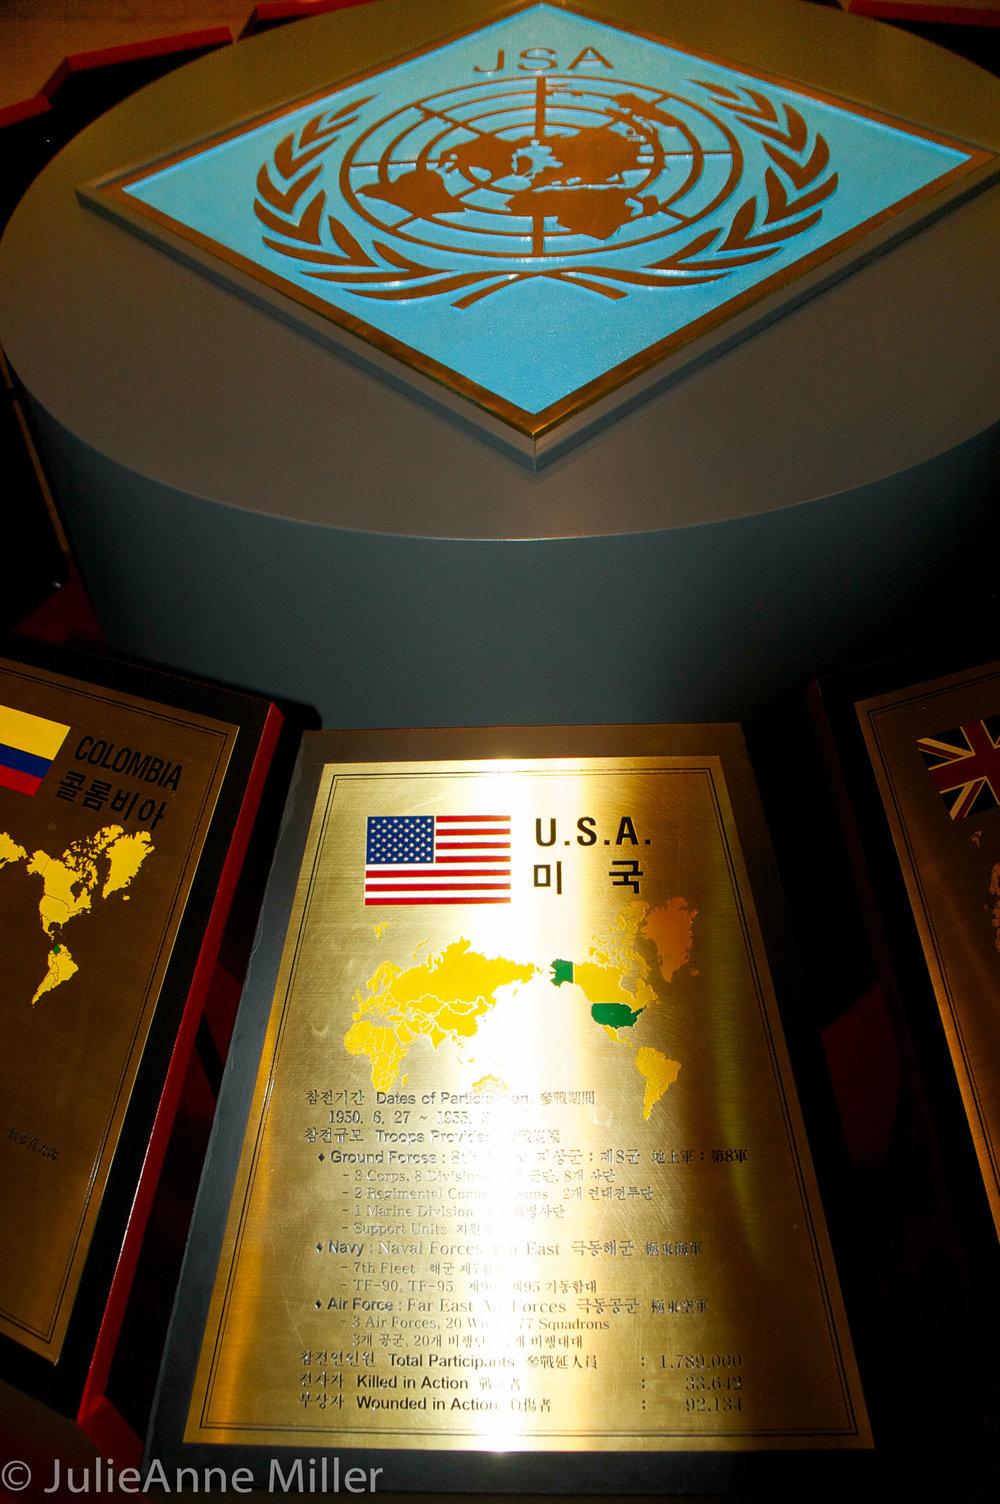 USA memorial